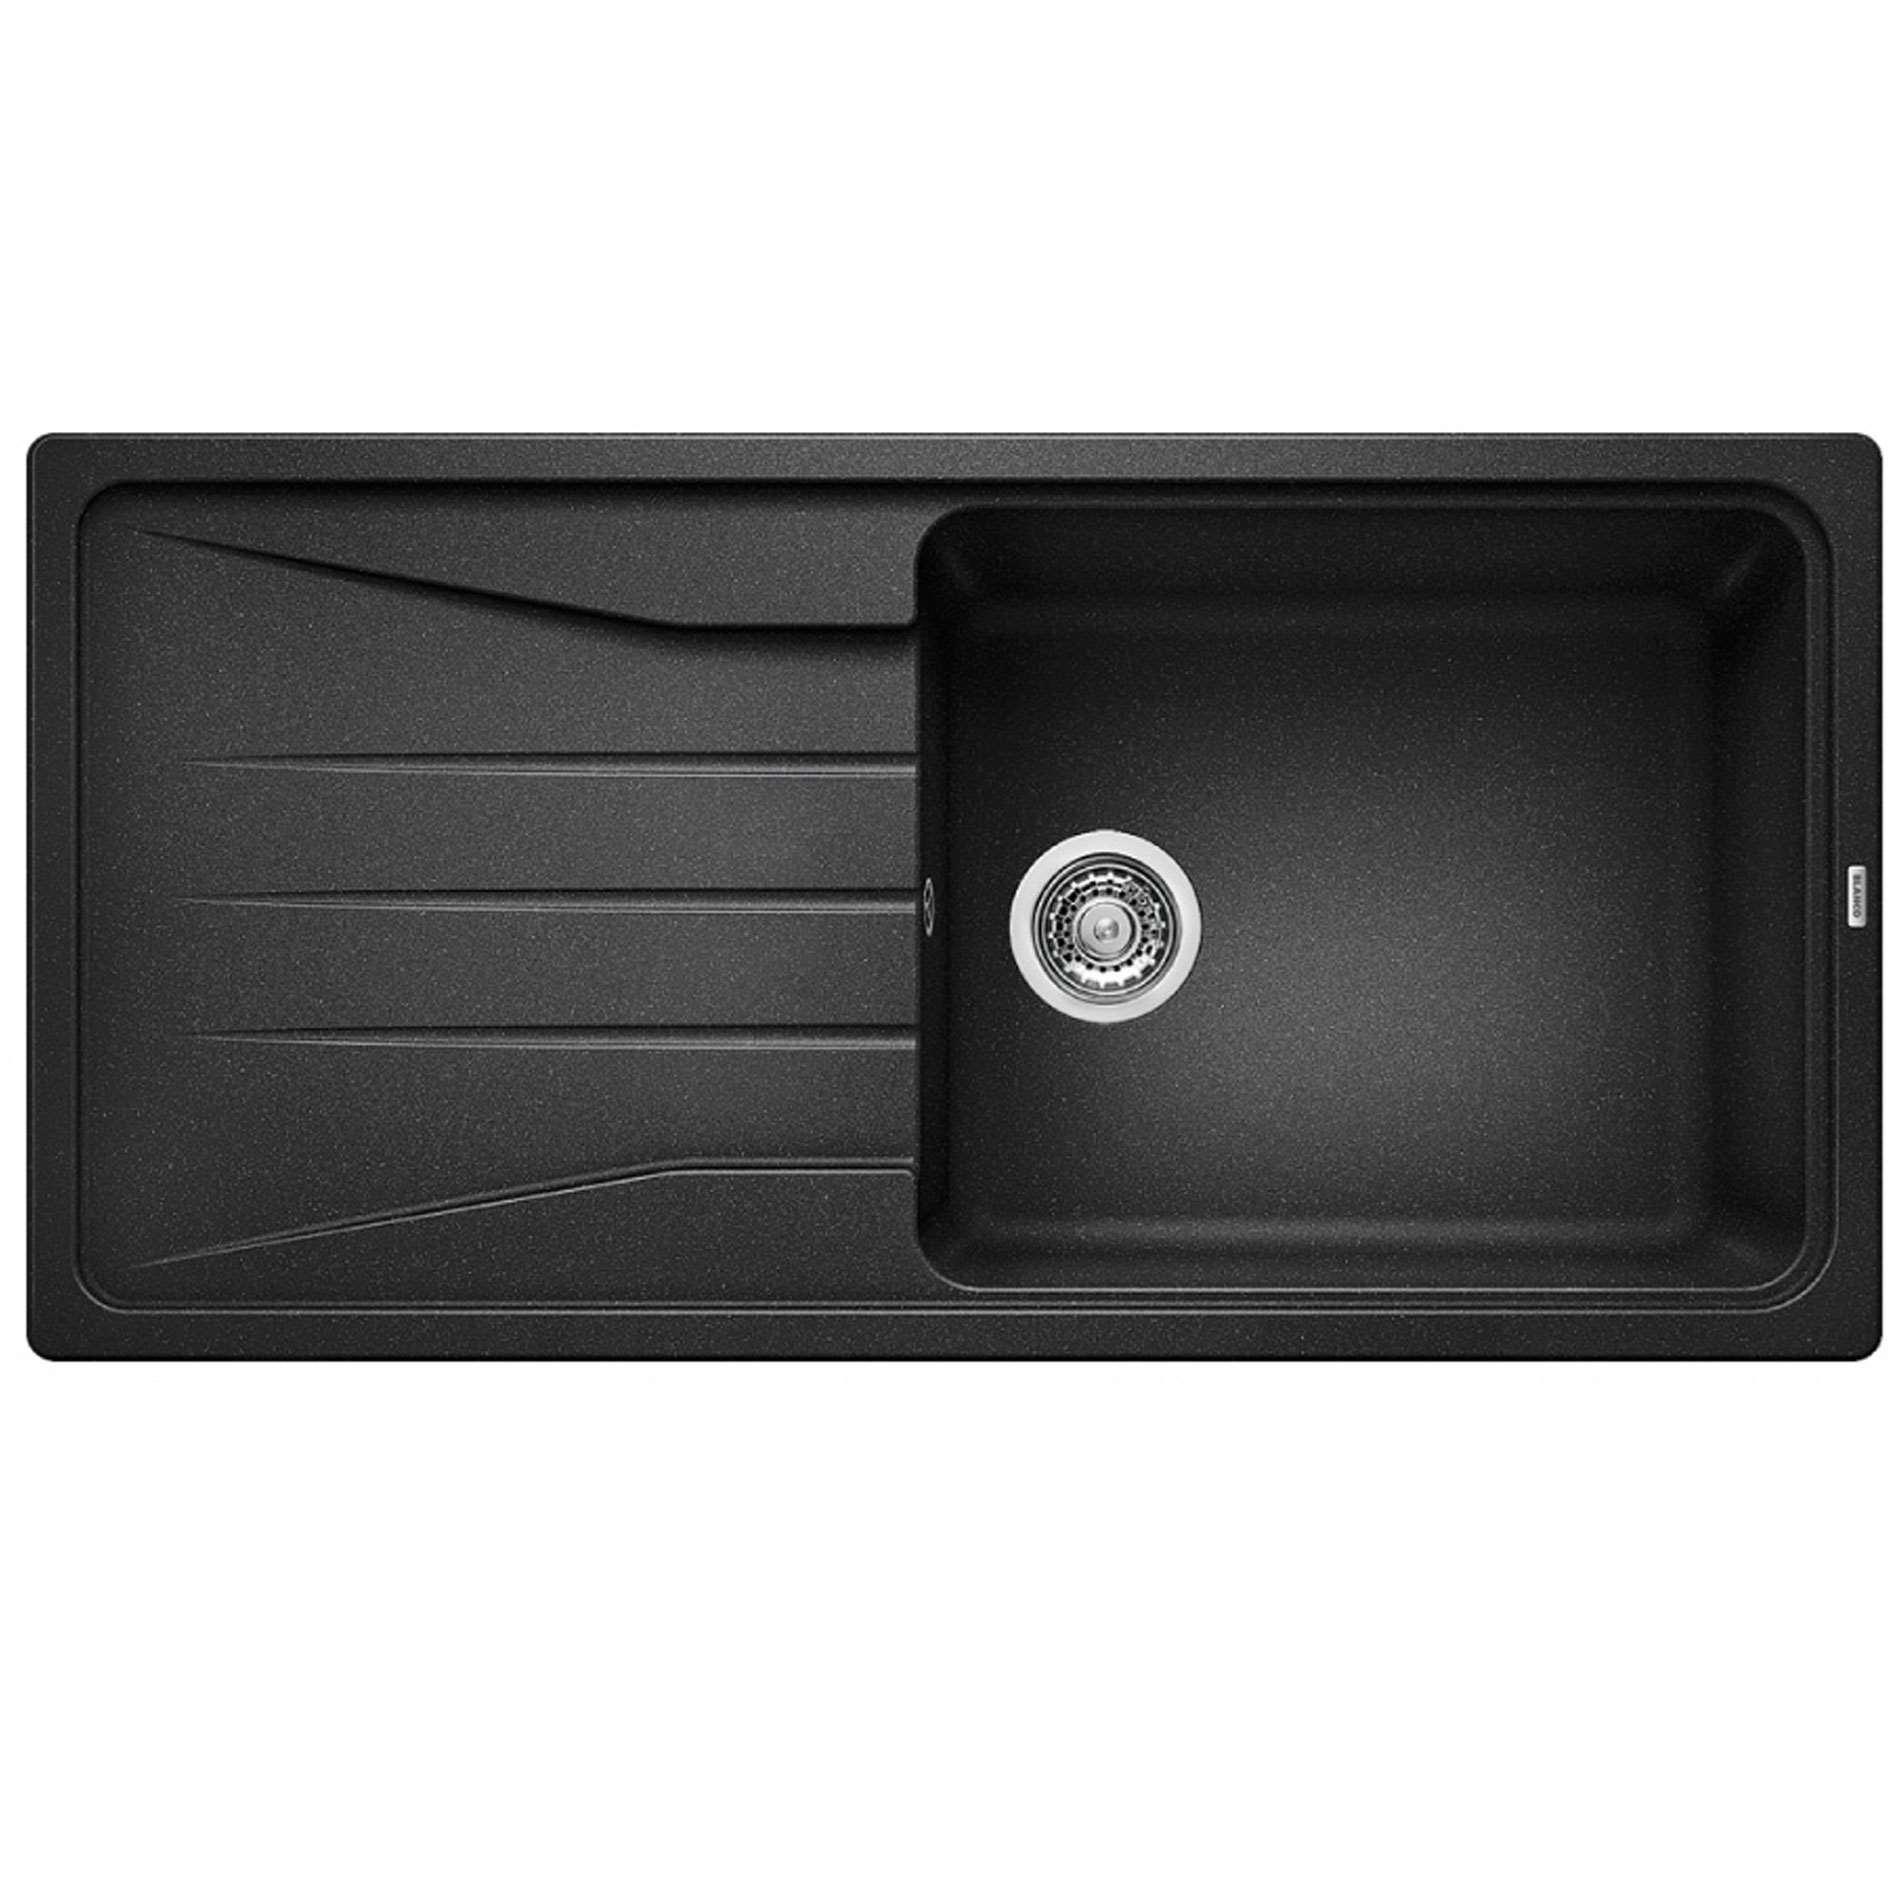 Blanco Silgranit Anthracite Sink : Blanco: Sona XL 6 S Anthracite Silgranit sink - Kitchen Sinks & Taps